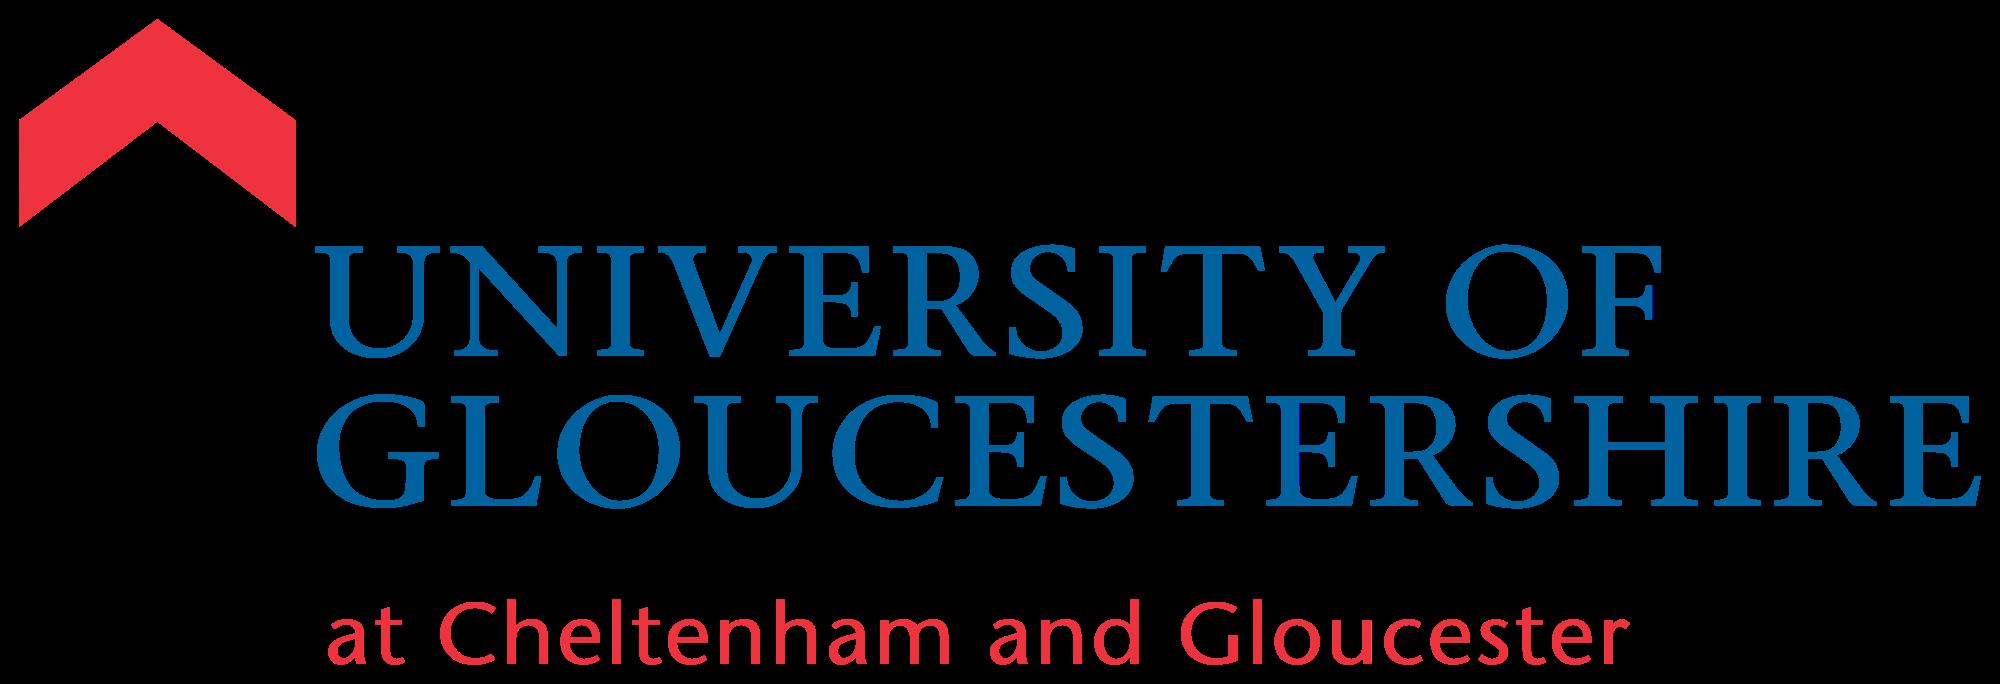 Gloucestershire_logo (1).png